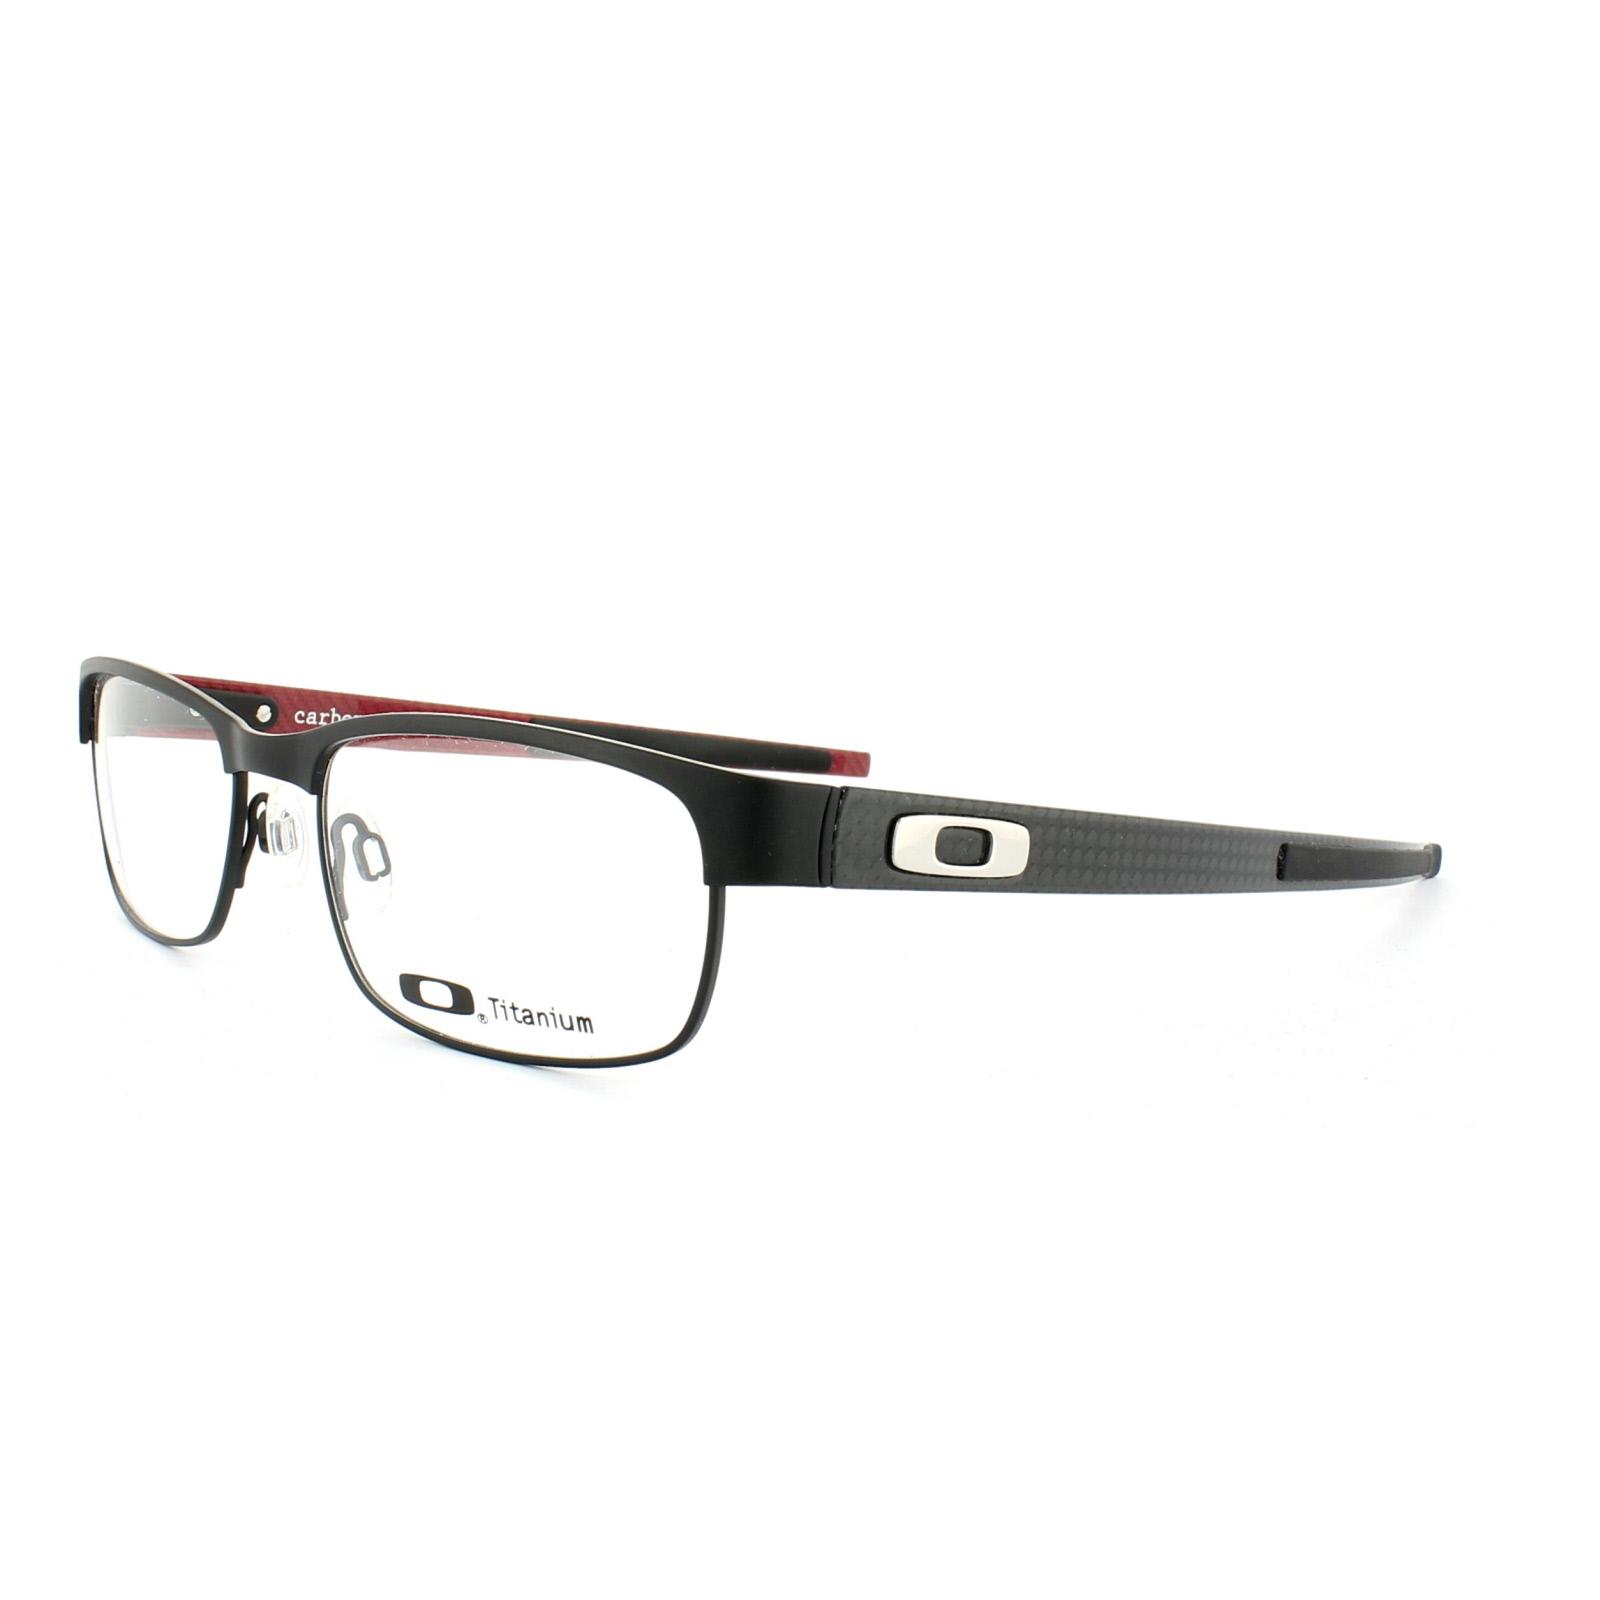 oakley eyeglasses replacement parts